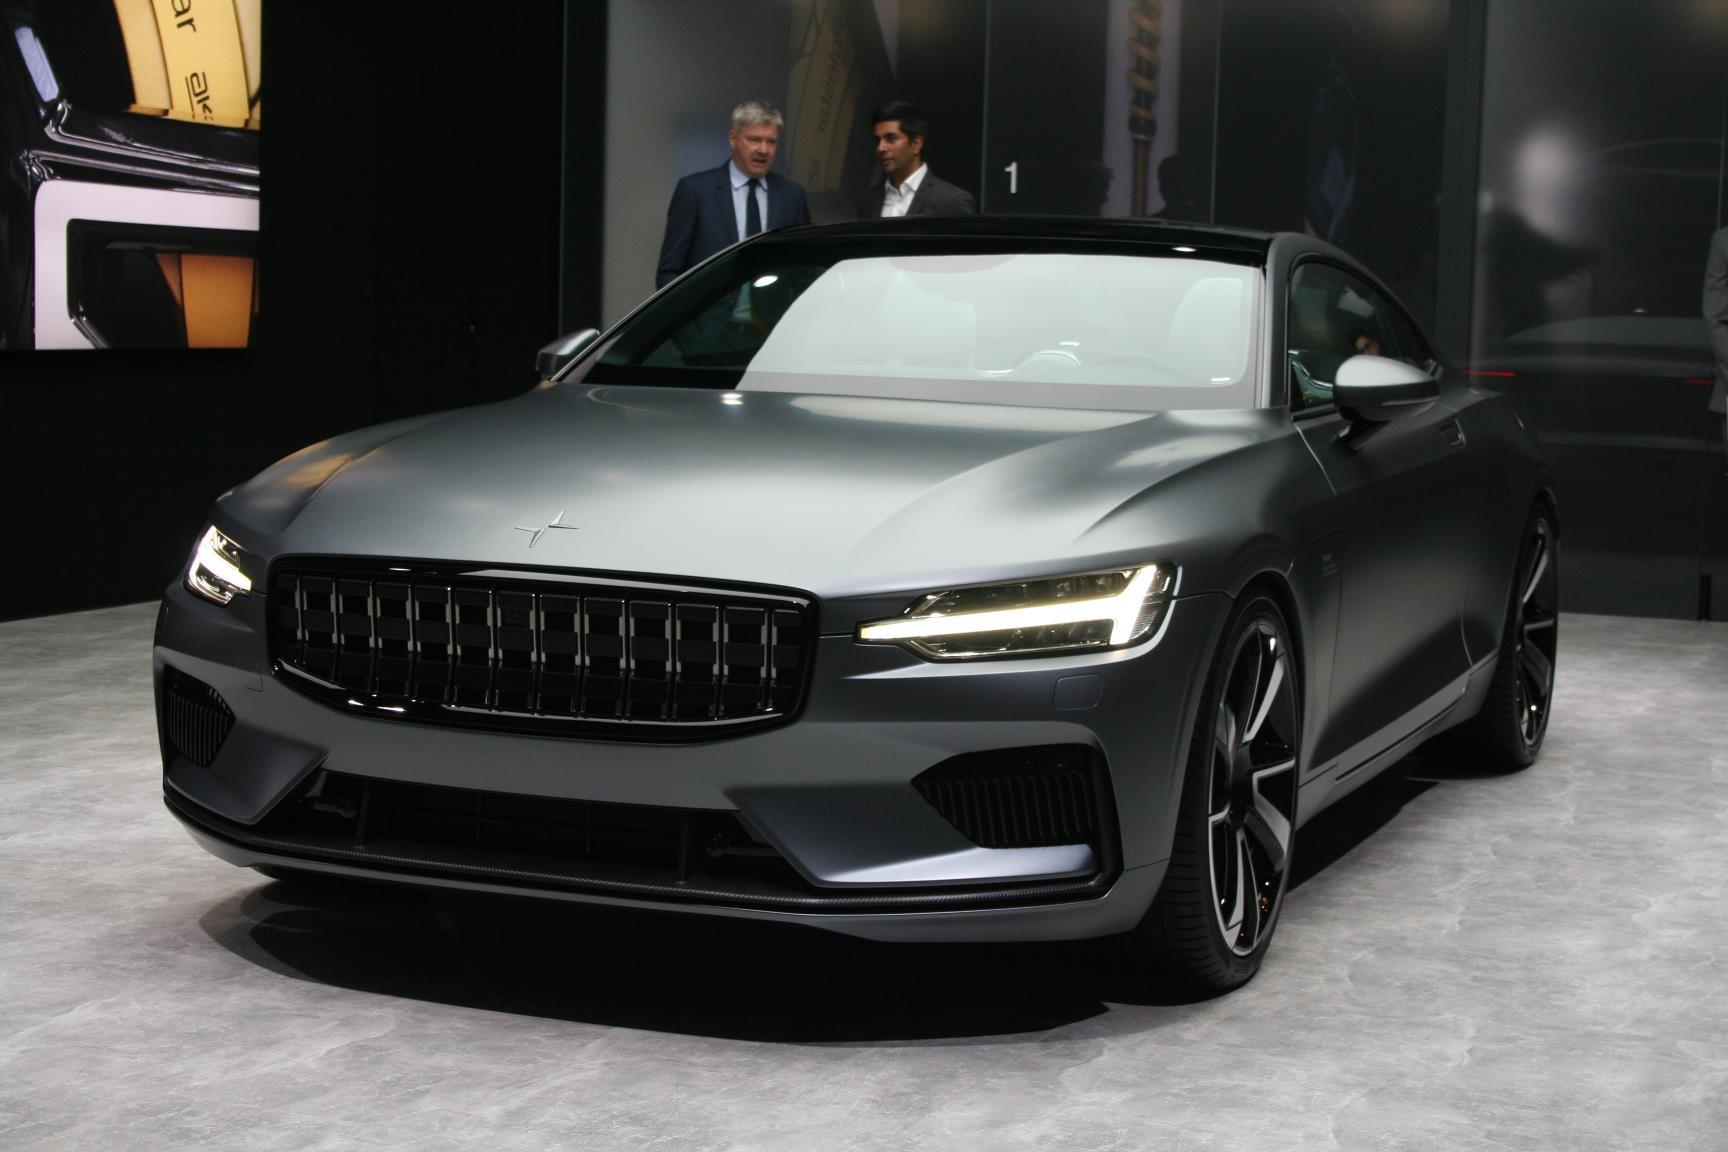 Geneva Motor Show 2018 Mega Gallery Part 1 (147)